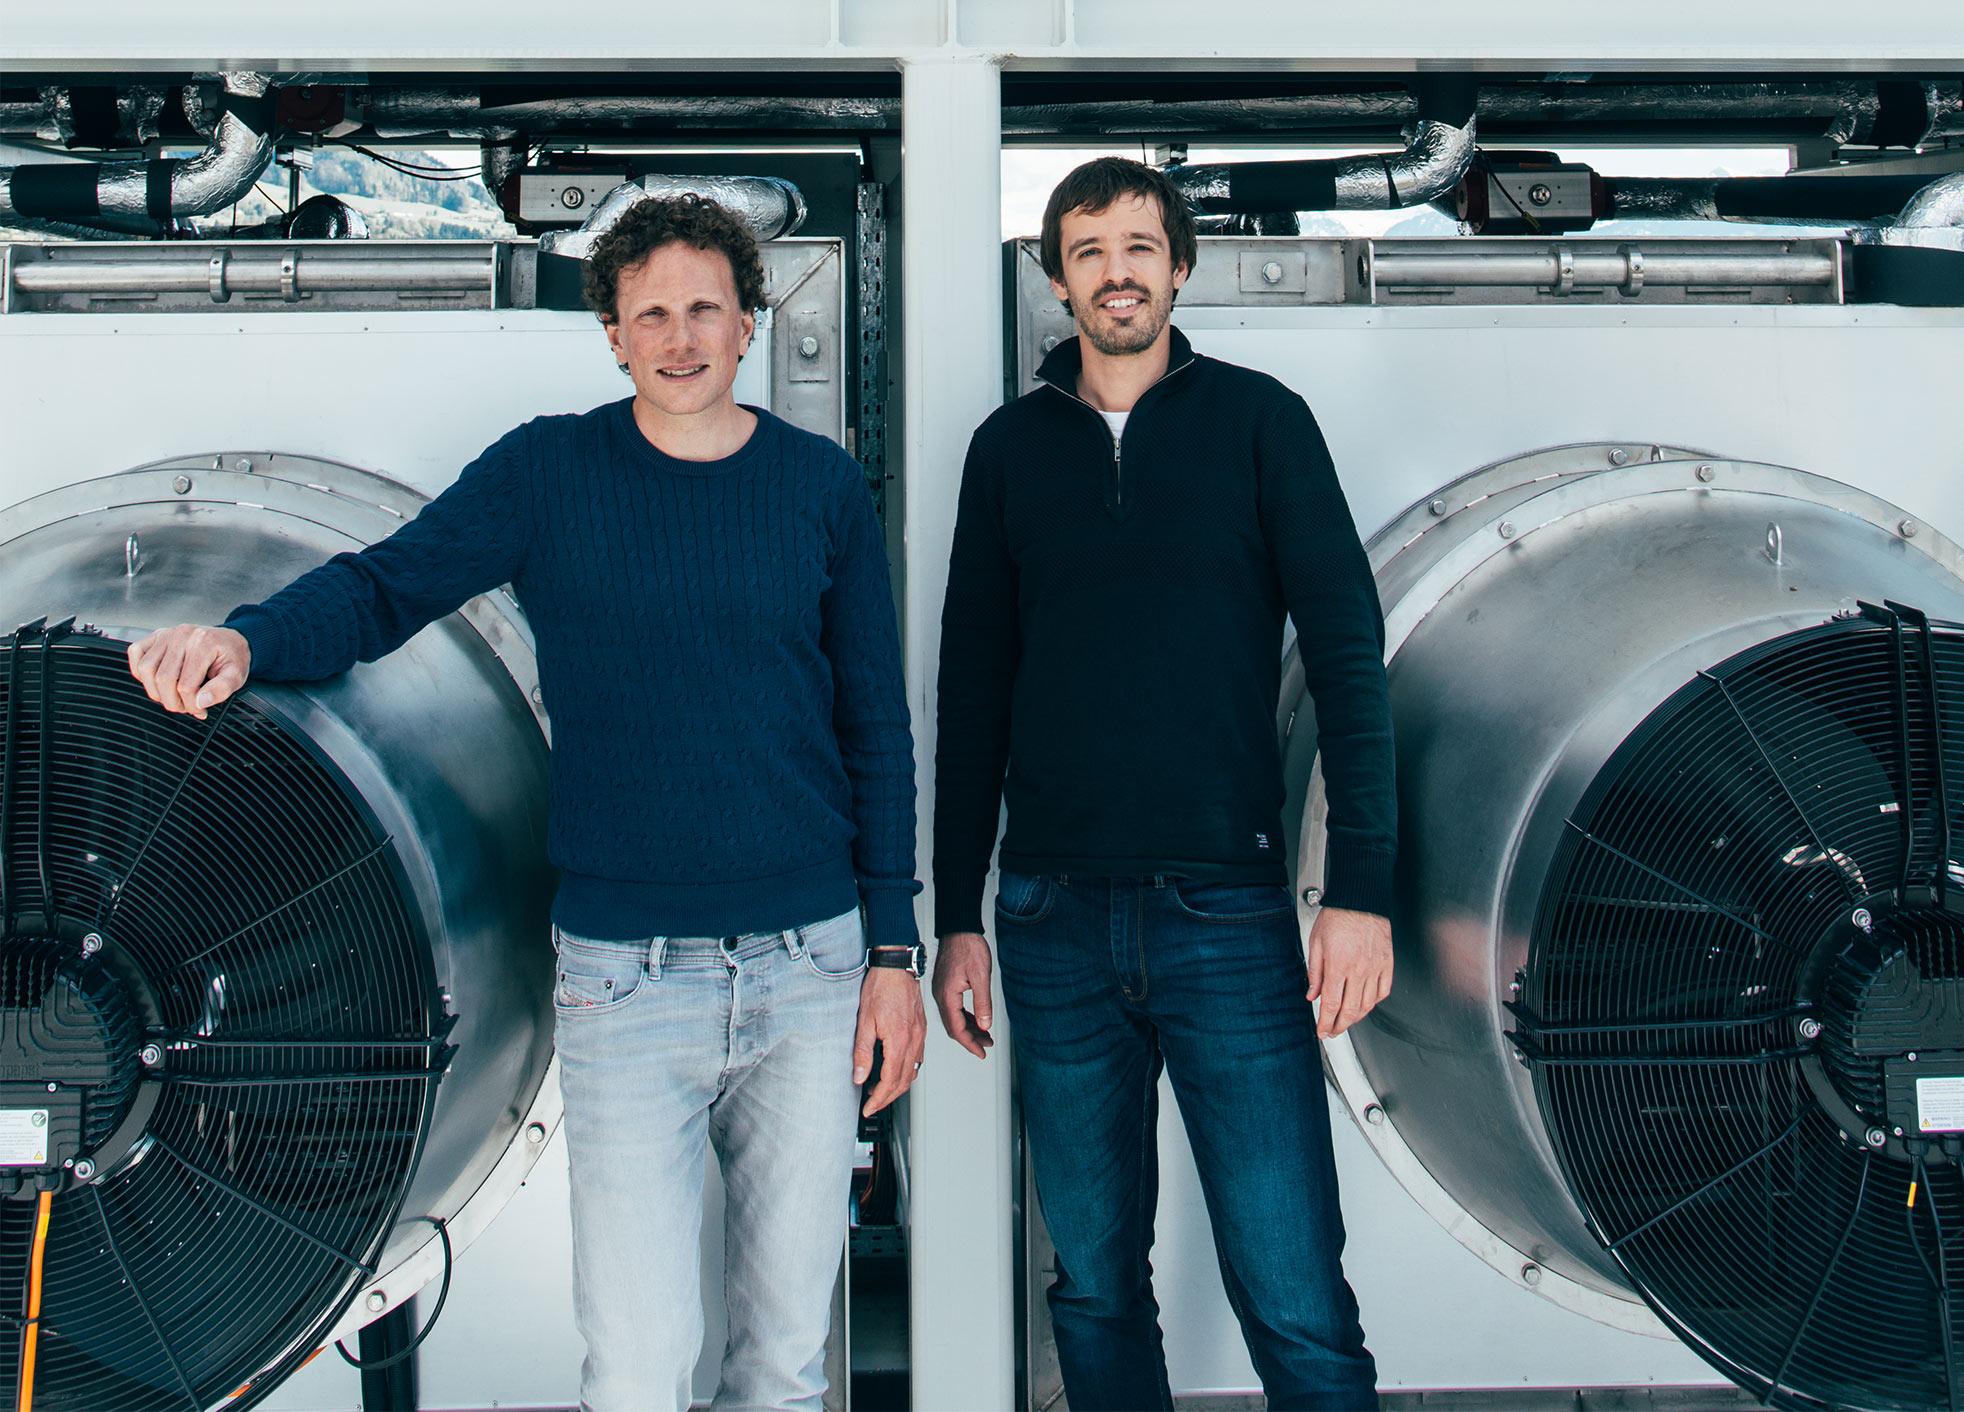 Christoph Gebald and Jan Wurzbacher